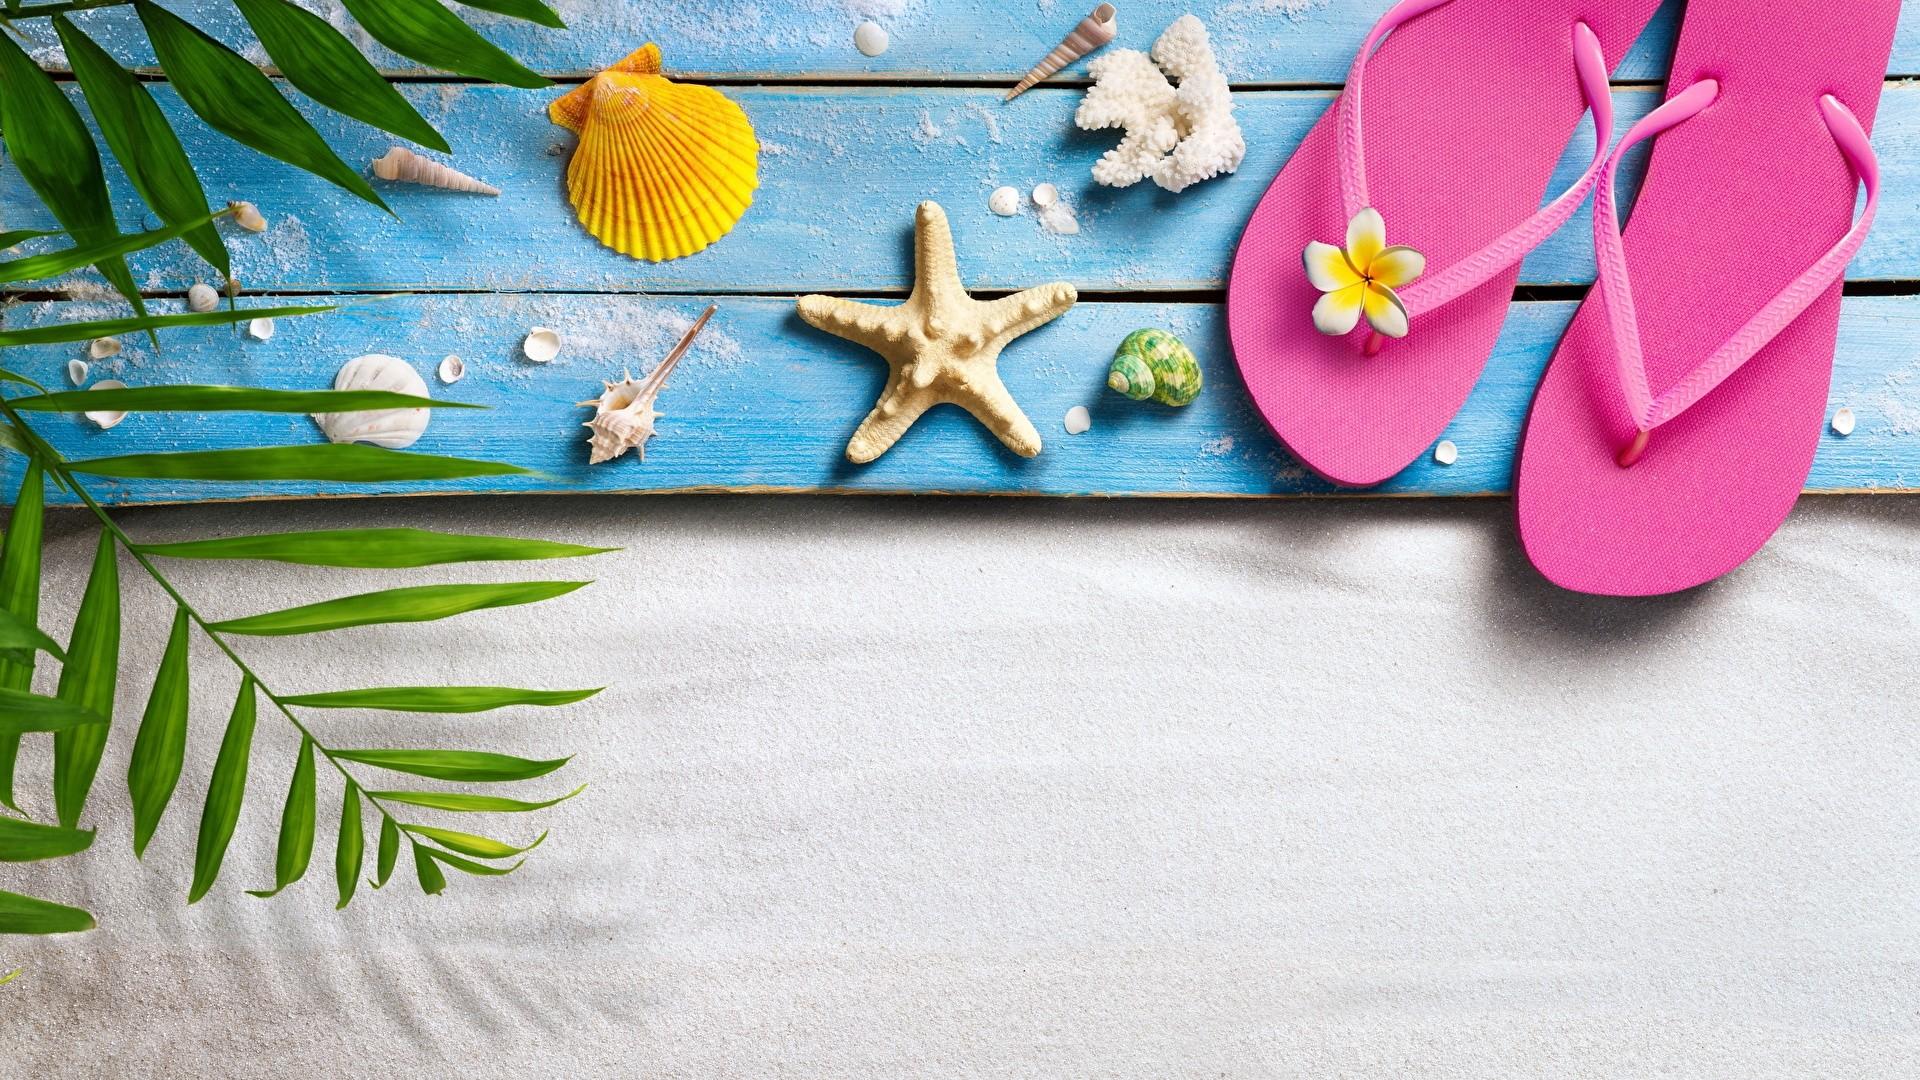 Seashells On Boards wallpaper for pc